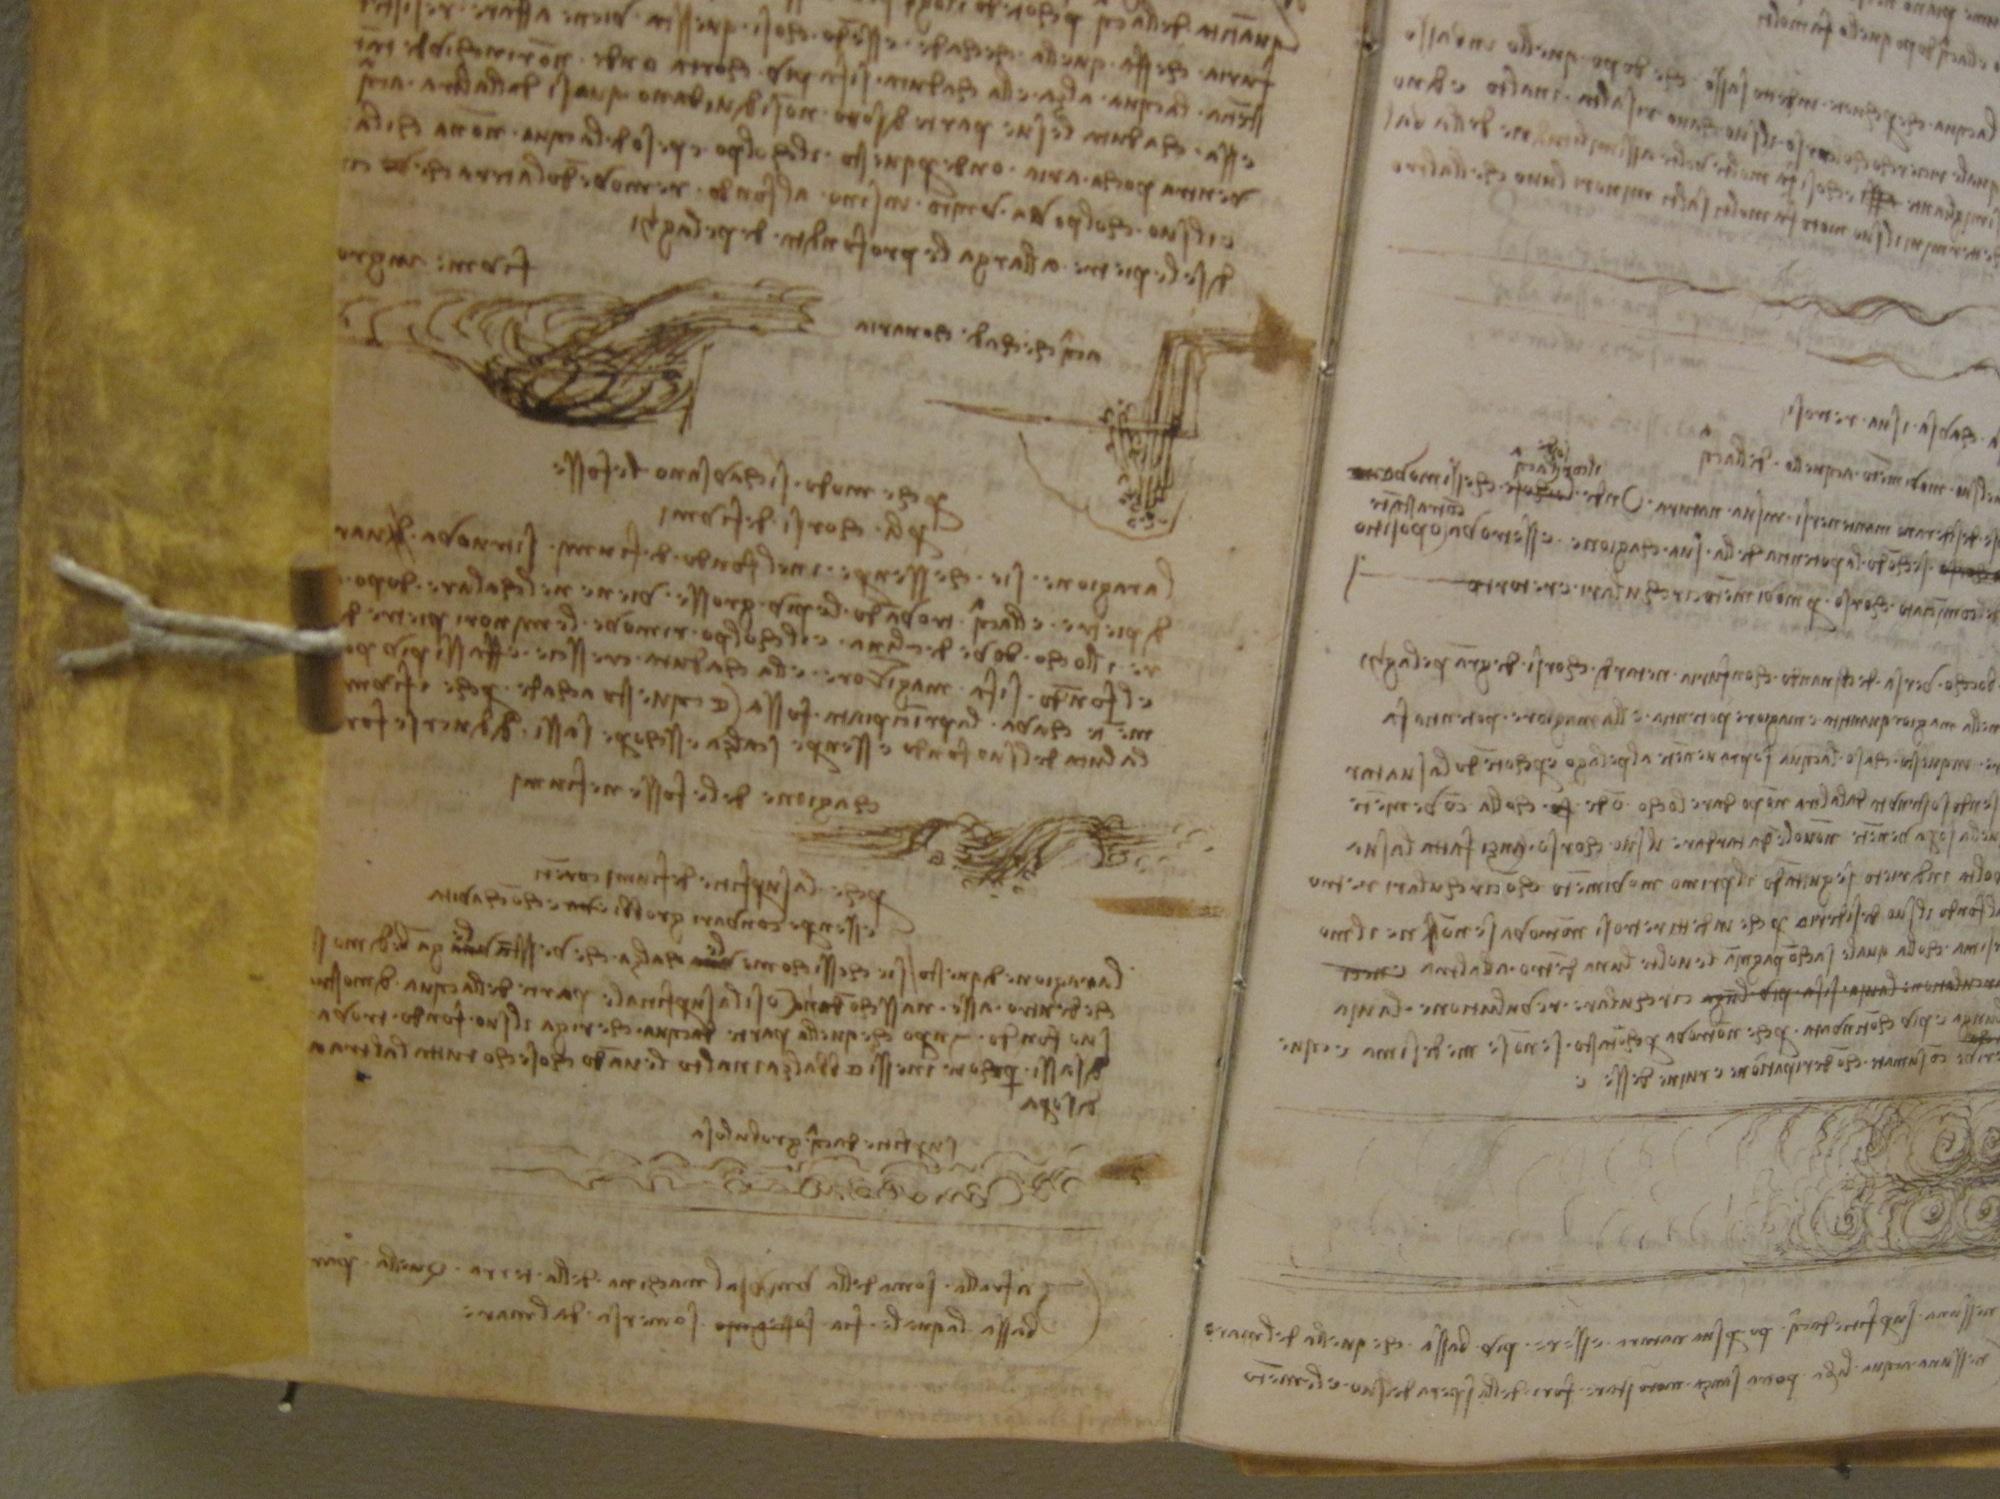 penulisan kertas teks tulisan tangan sejarah dokumen Engelbart